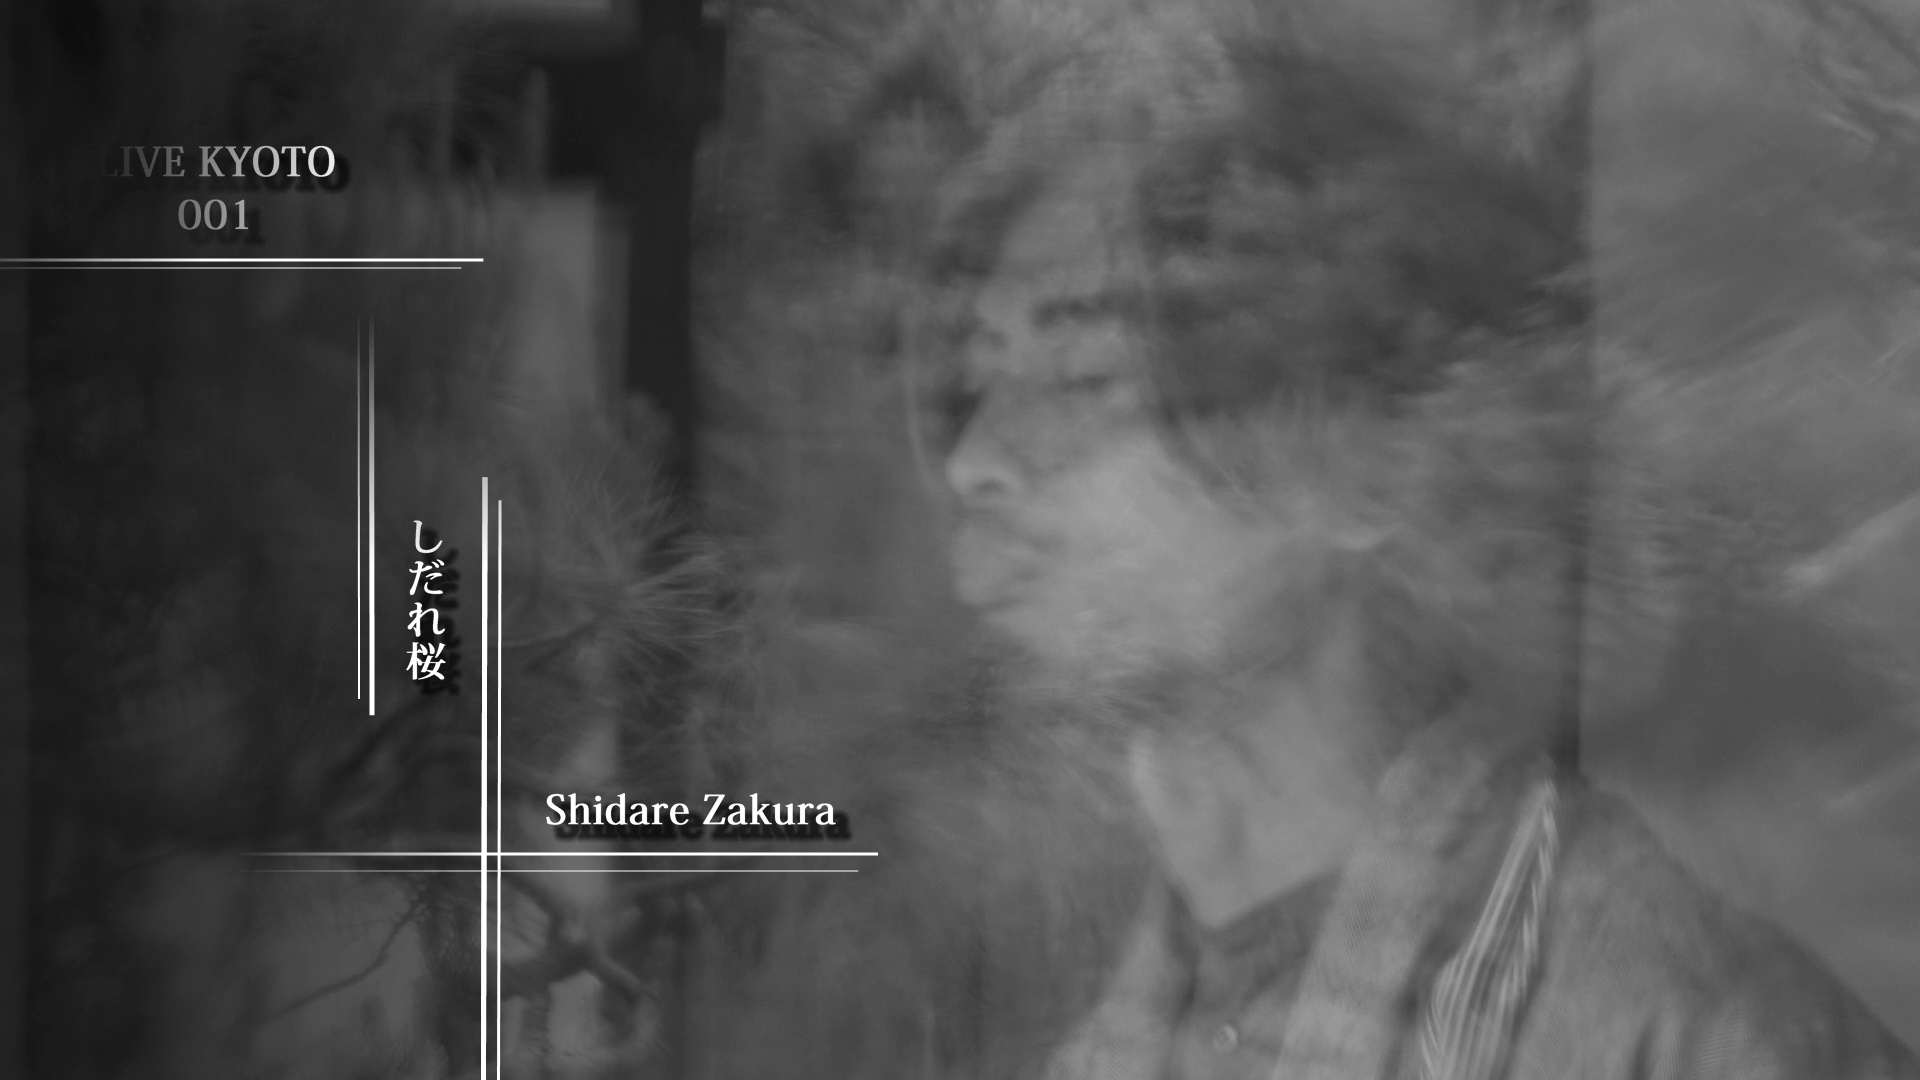 LIVE KYOTO 001 しだれ桜 ShidareZakura